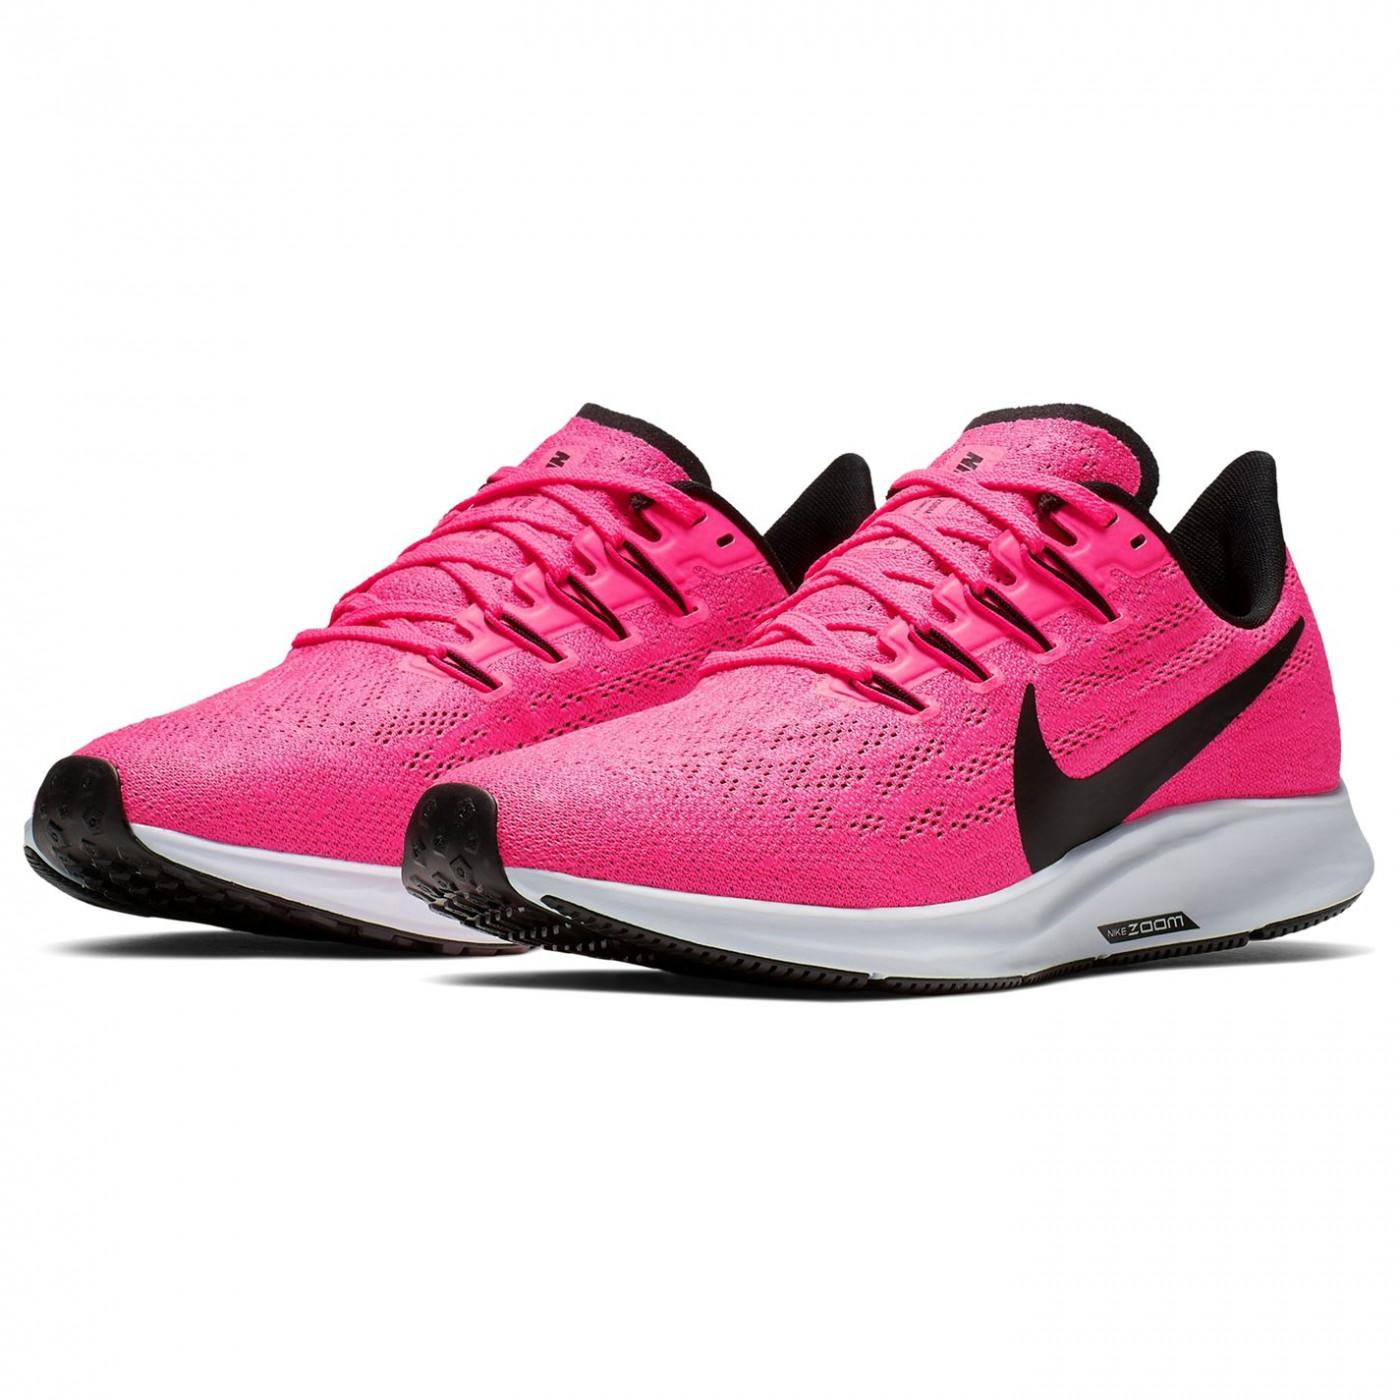 cheap for discount 75cf5 00c74 Nike Air Zoom Pegasus 36 Ladies Running Shoes Pink/Black